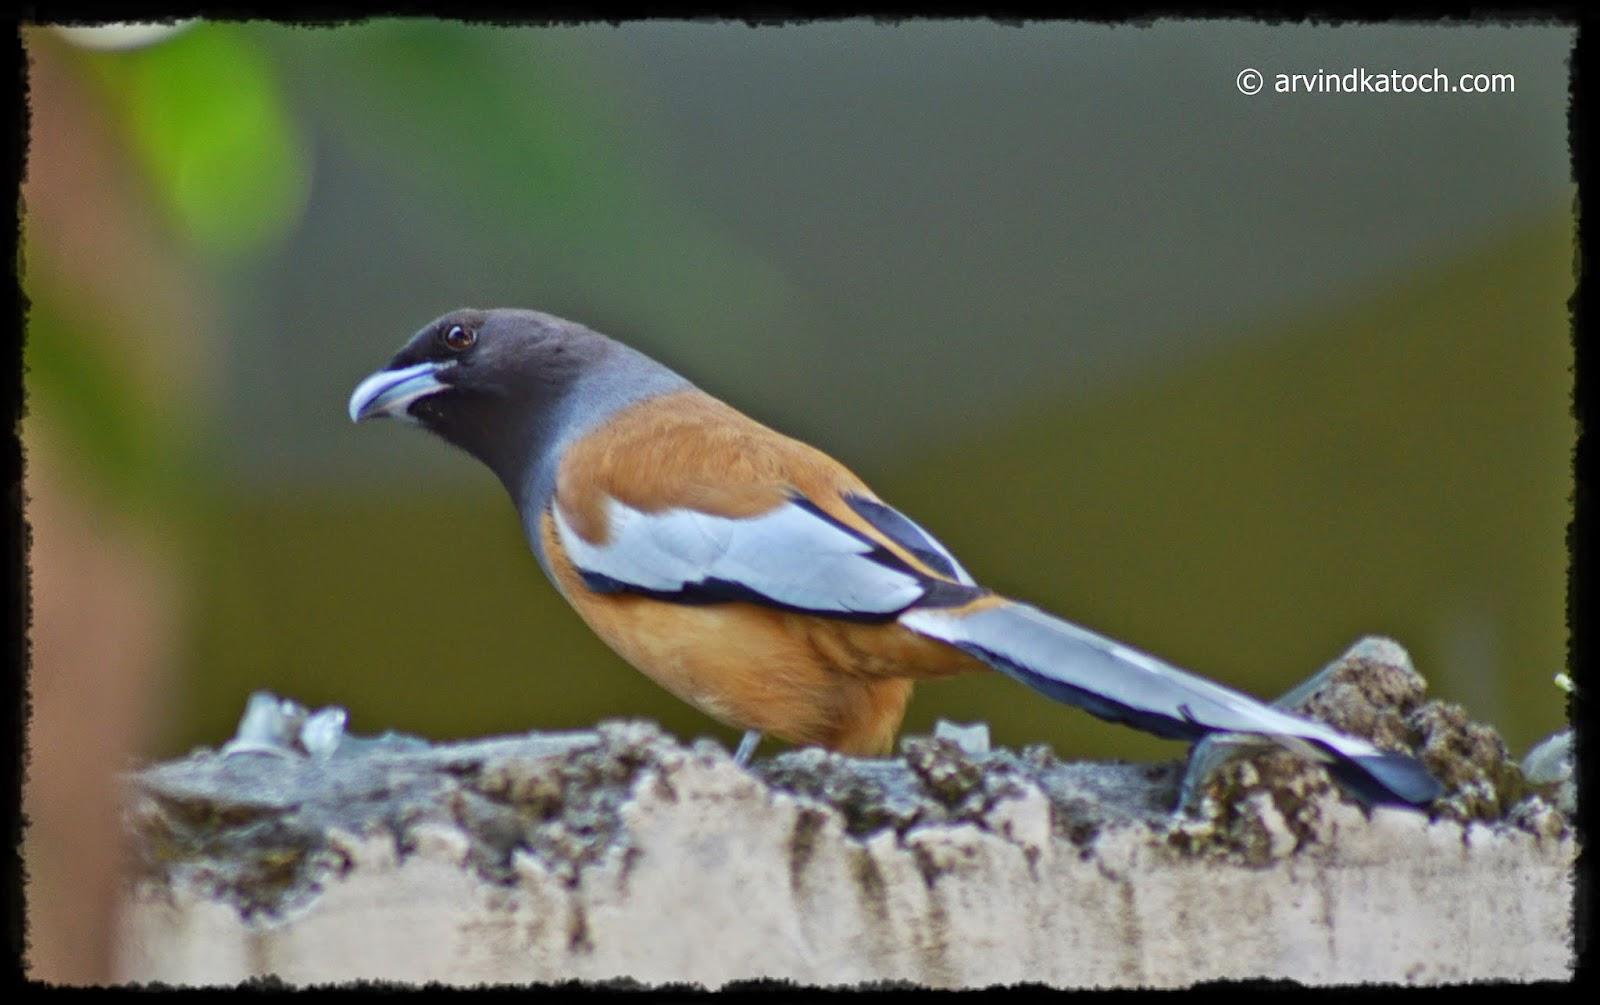 Punjab, Bird, Sweet Voice, Rufous Treepie